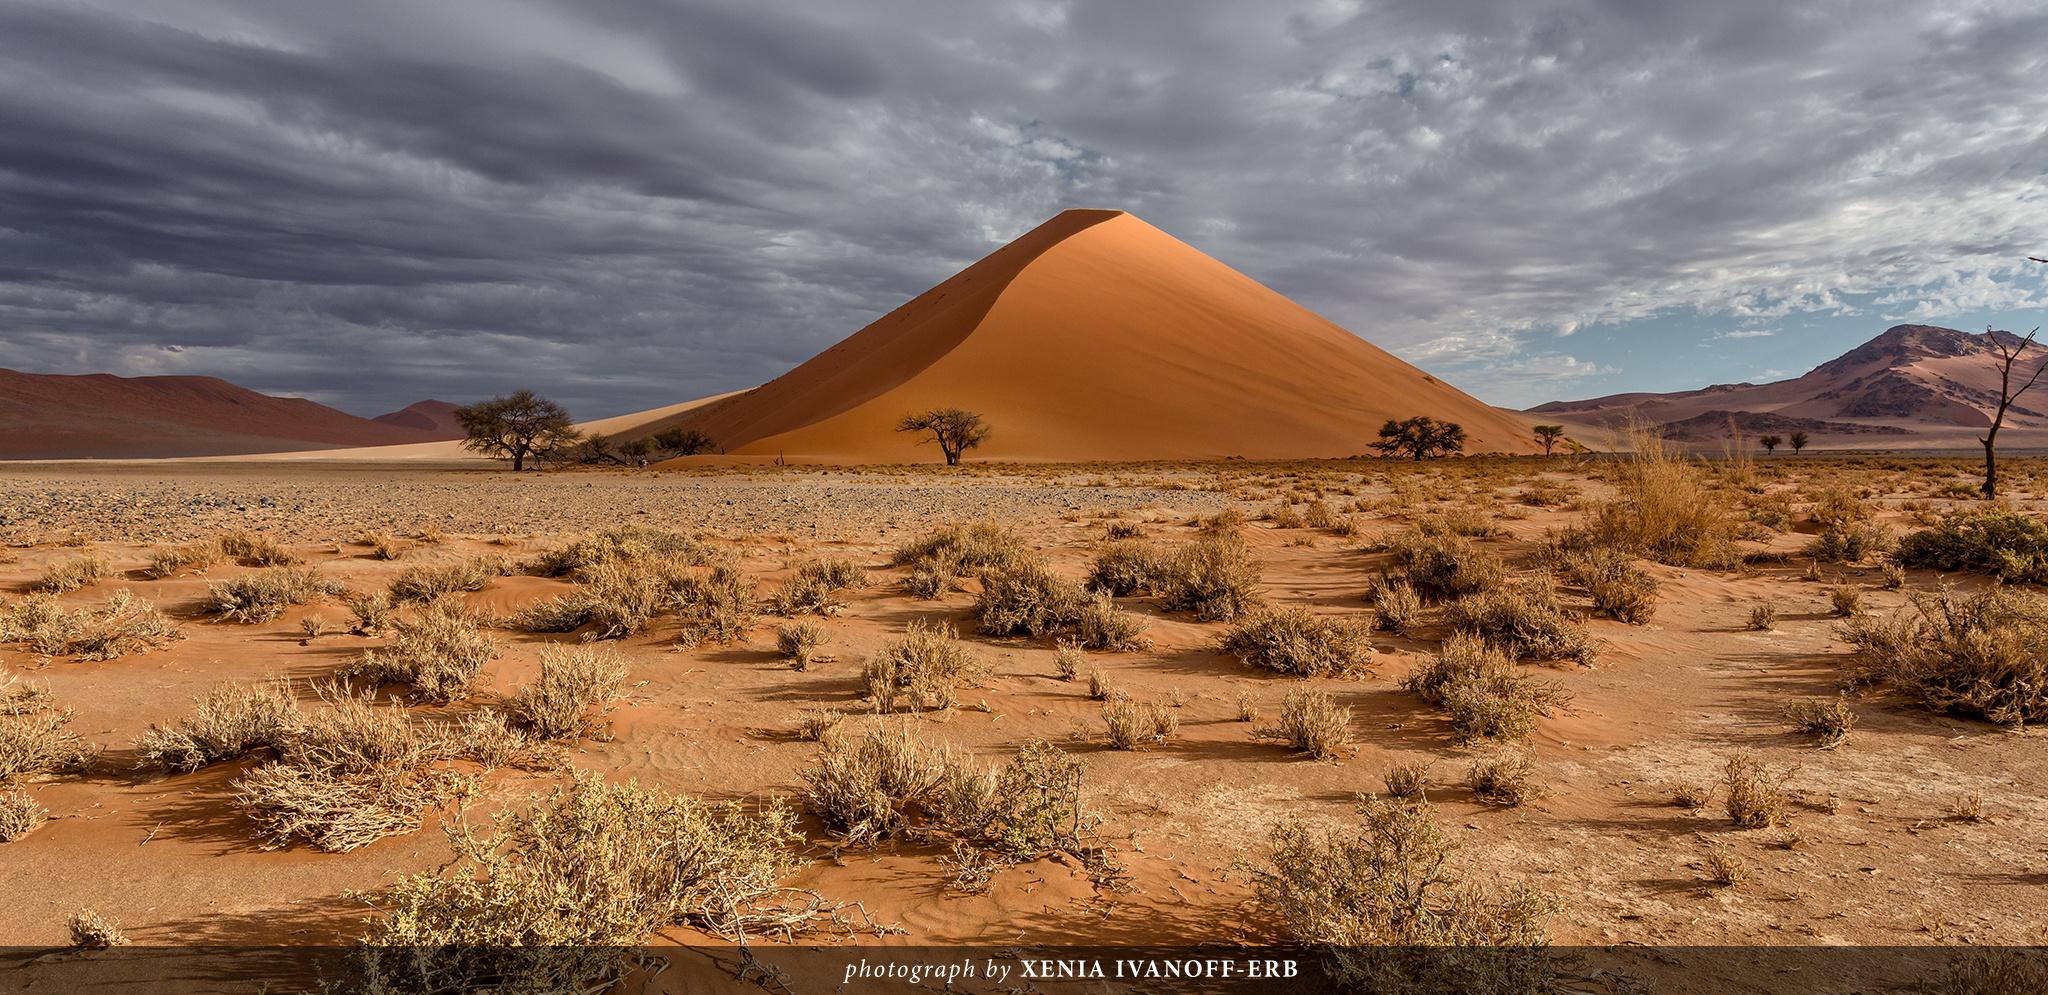 Dune 40. Tsauchab Valley, Namibia